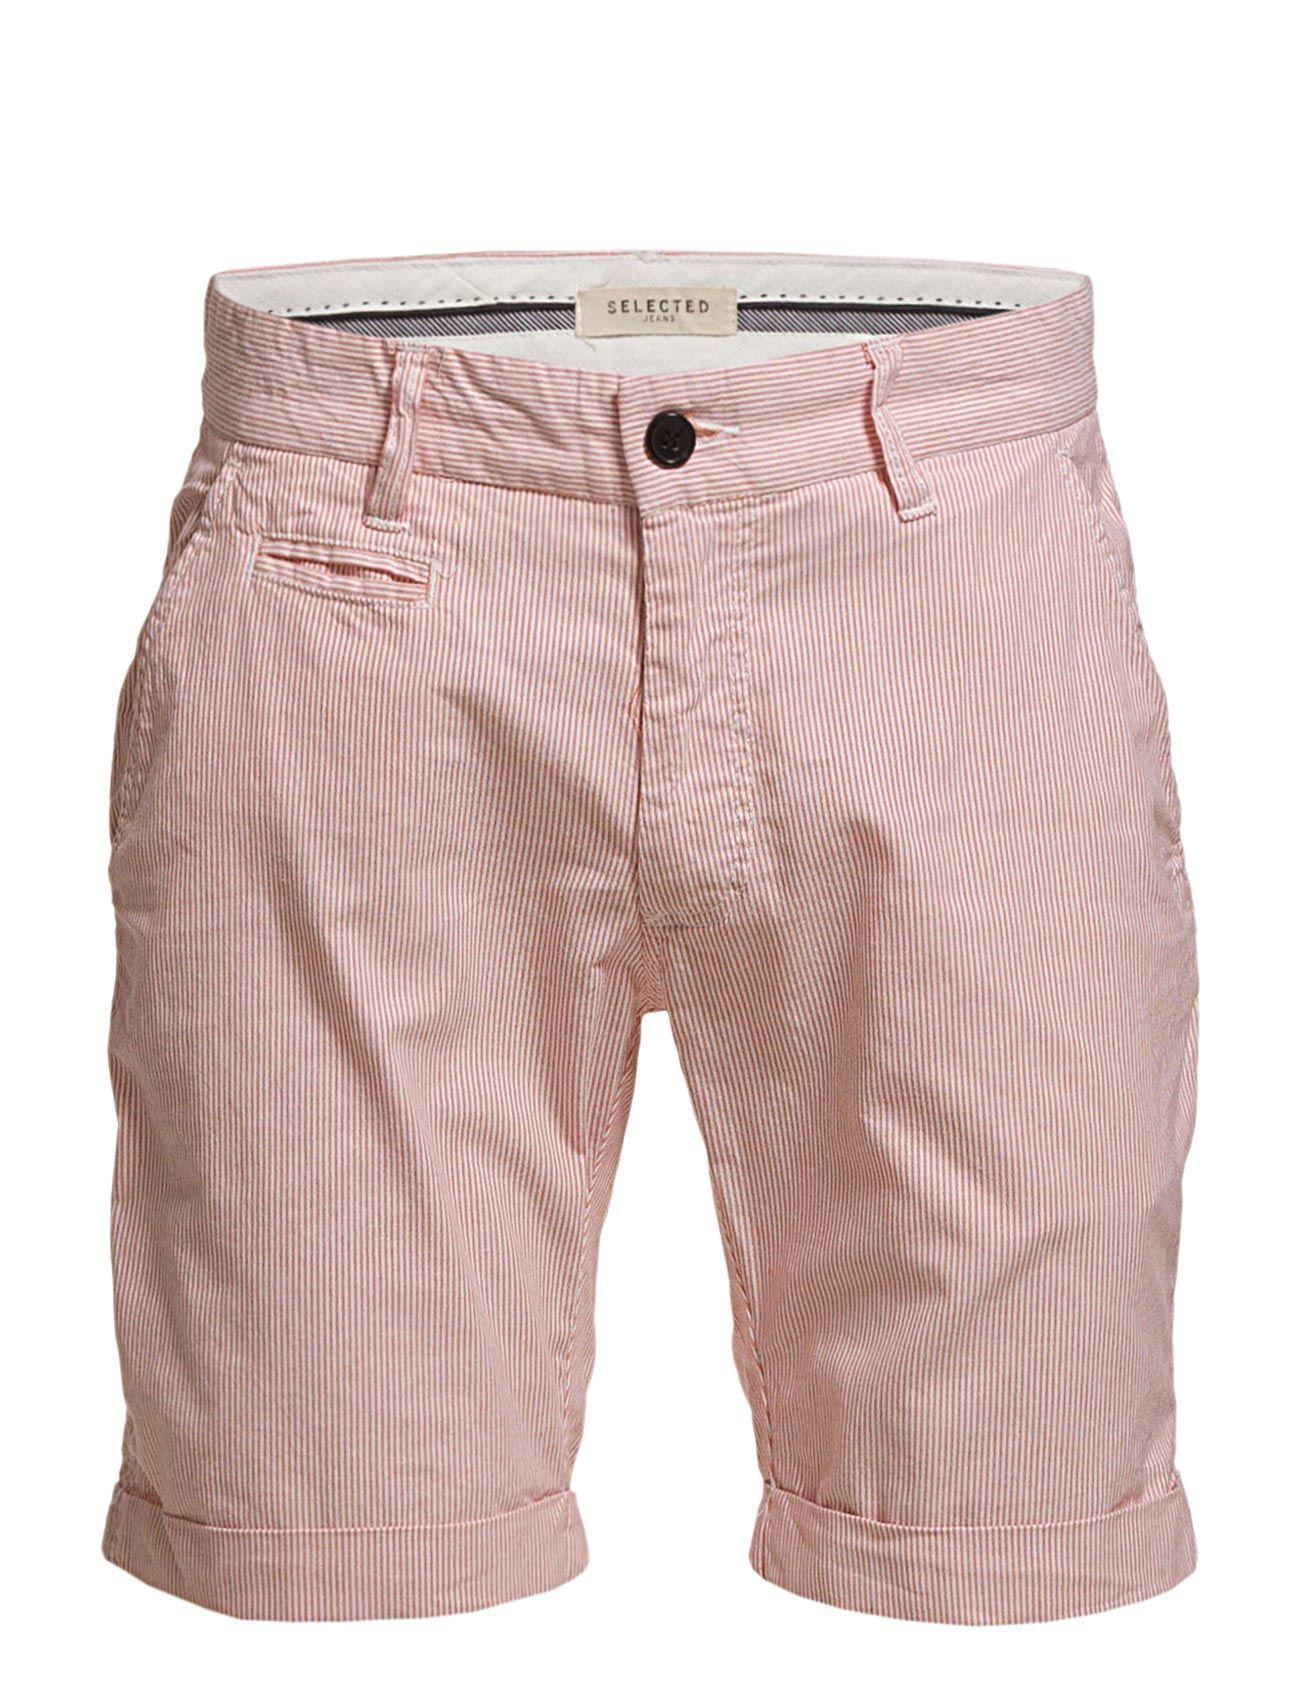 Three Paris Carnelian Stripe Shorts C